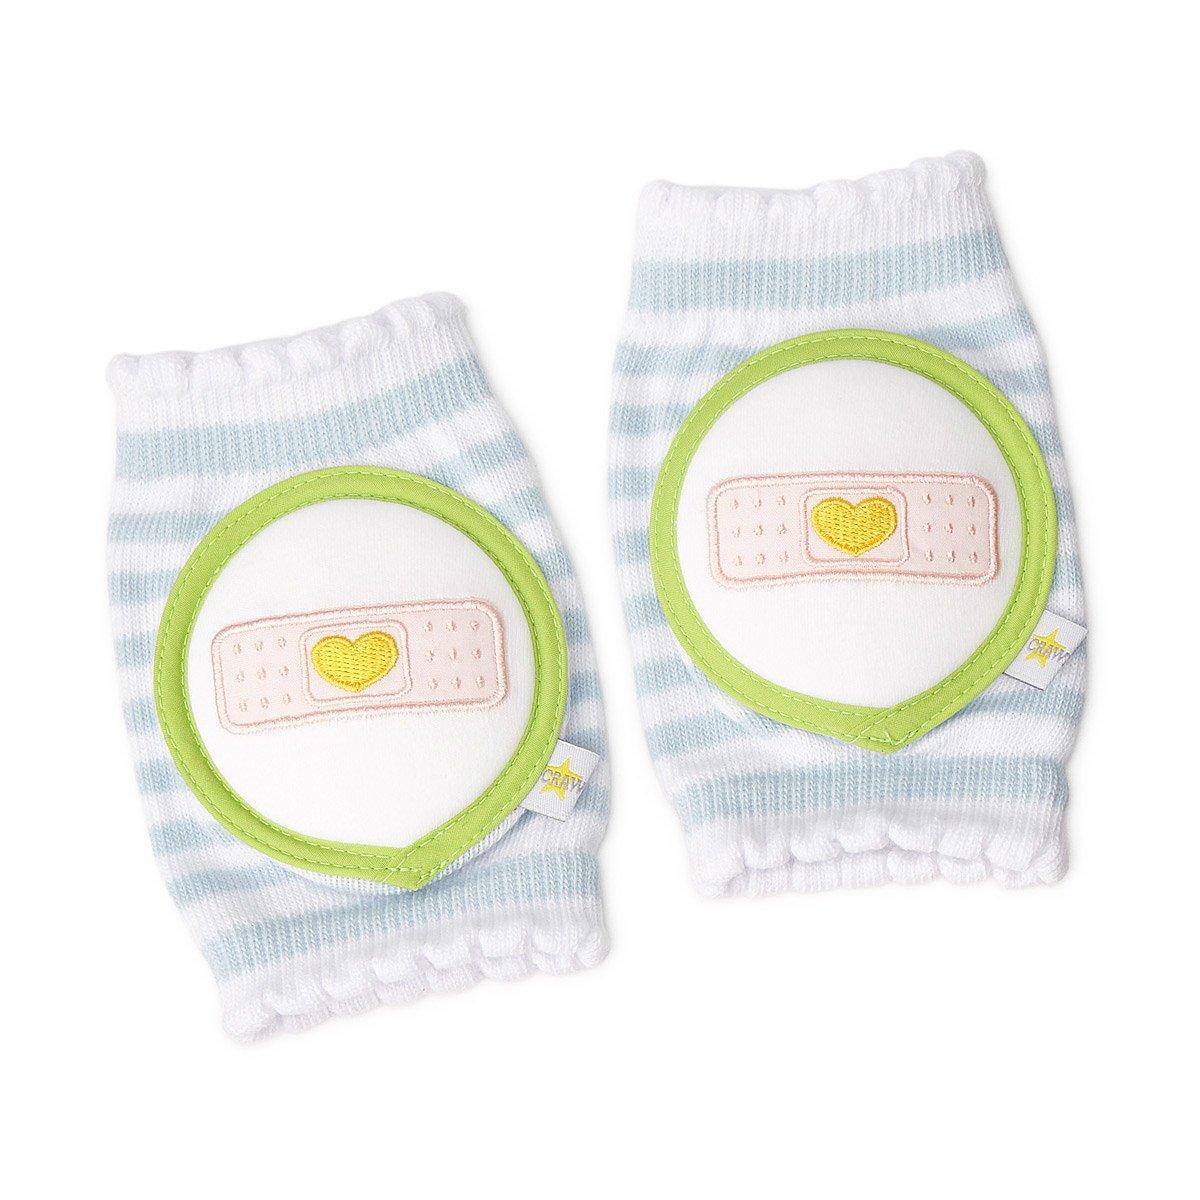 crawlings knee pads